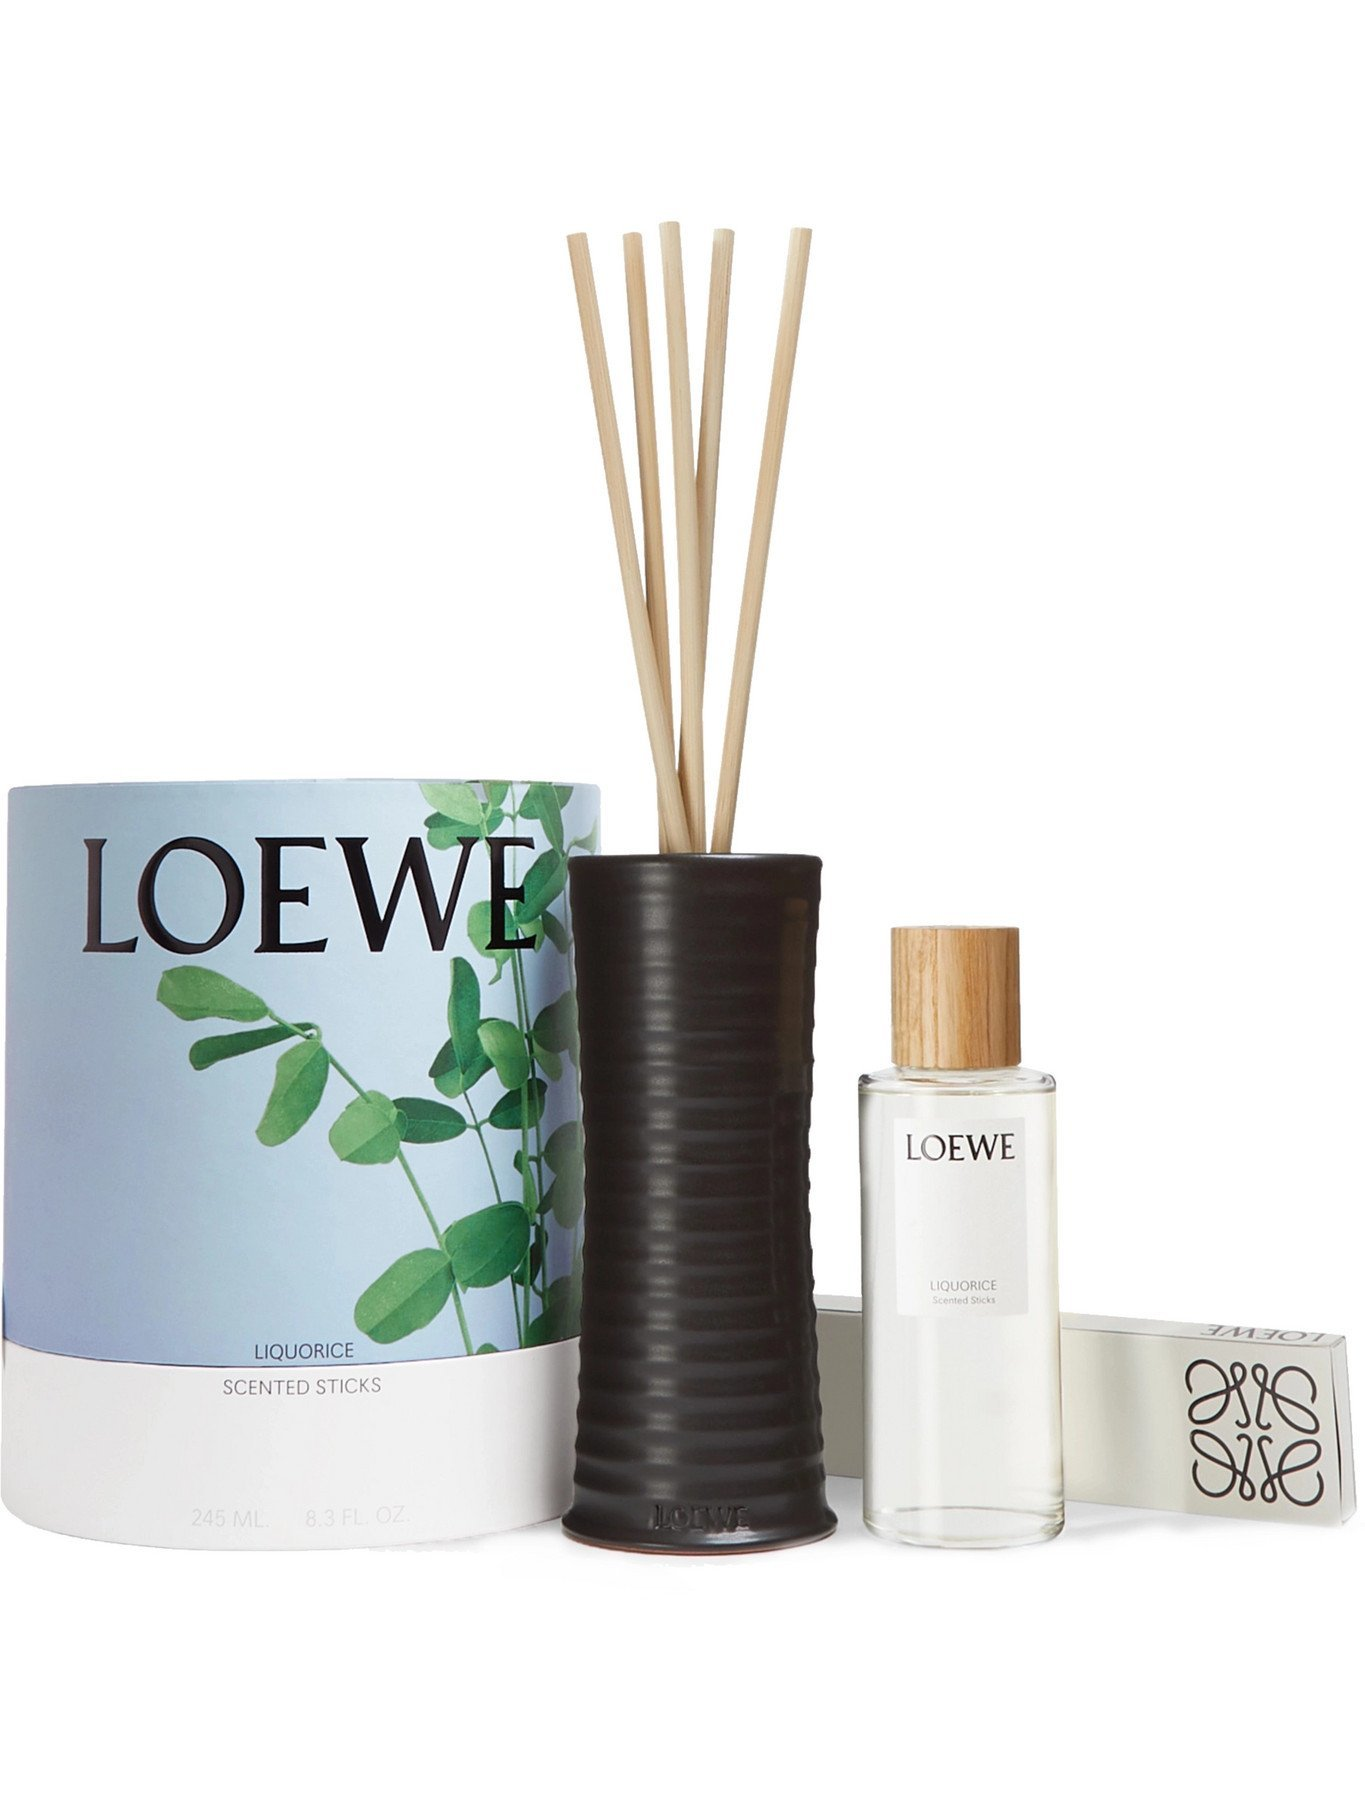 Photo: LOEWE HOME SCENTS - Liquorice Scent Diffuser, 245ml